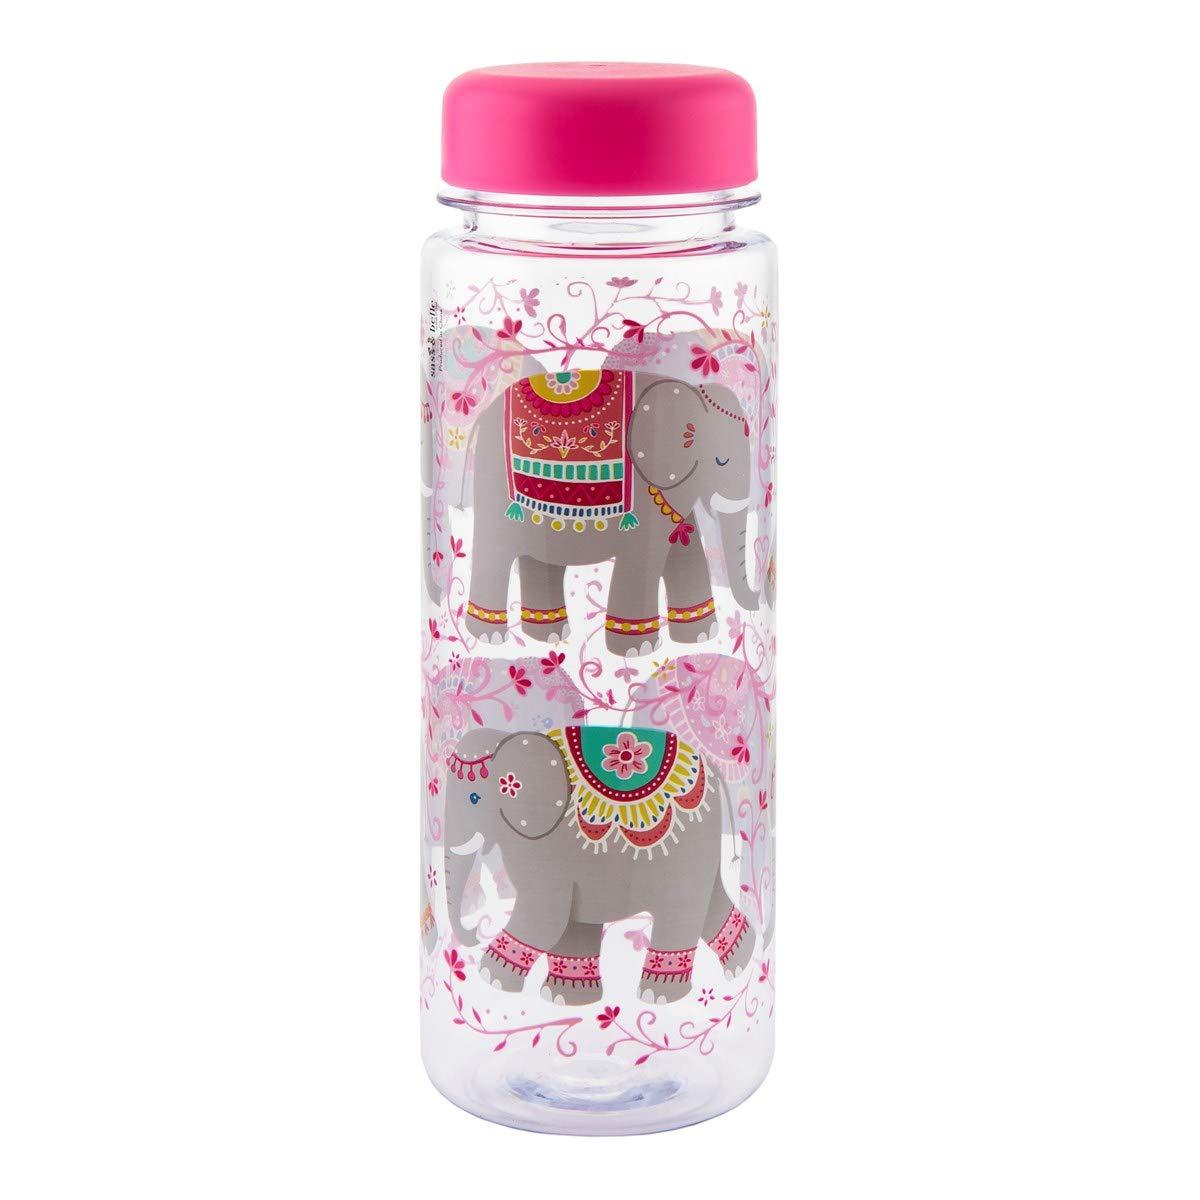 Sass and Belle Mandala Botella de agua con dise/ño de elefante